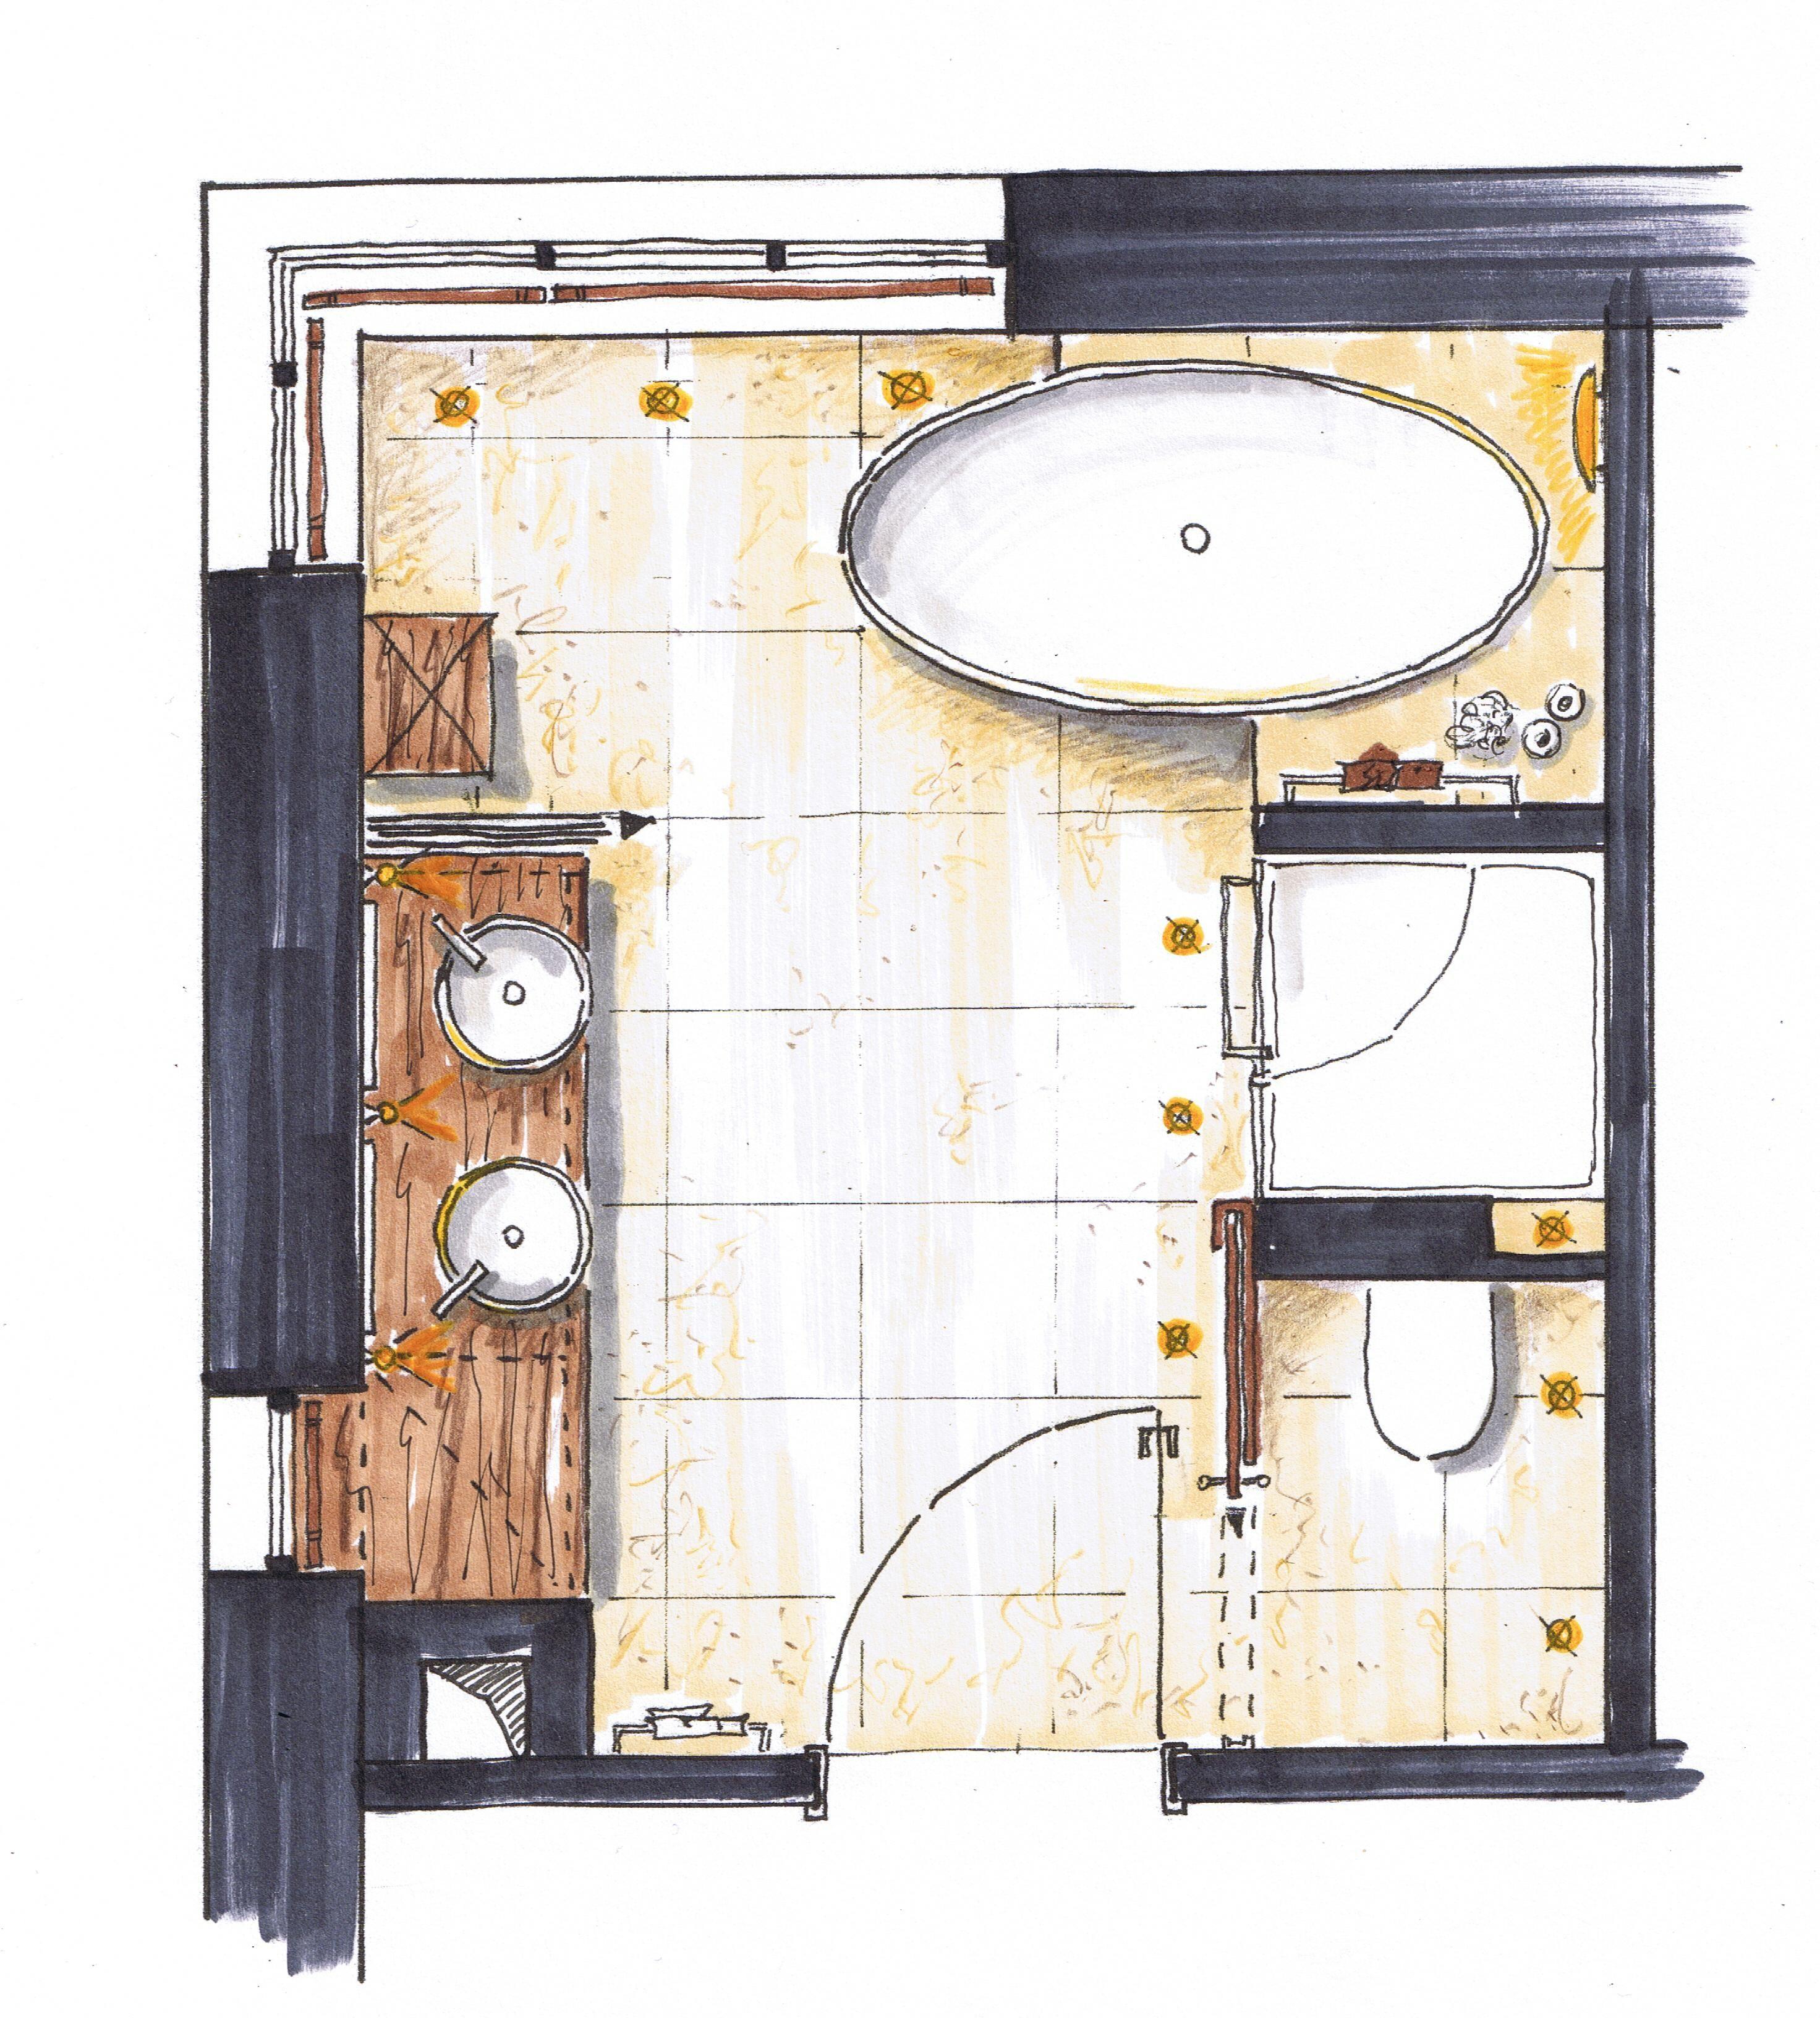 Pin von bernadette pleier auf living floor plan pinterest for Badezimmer ideen 9qm